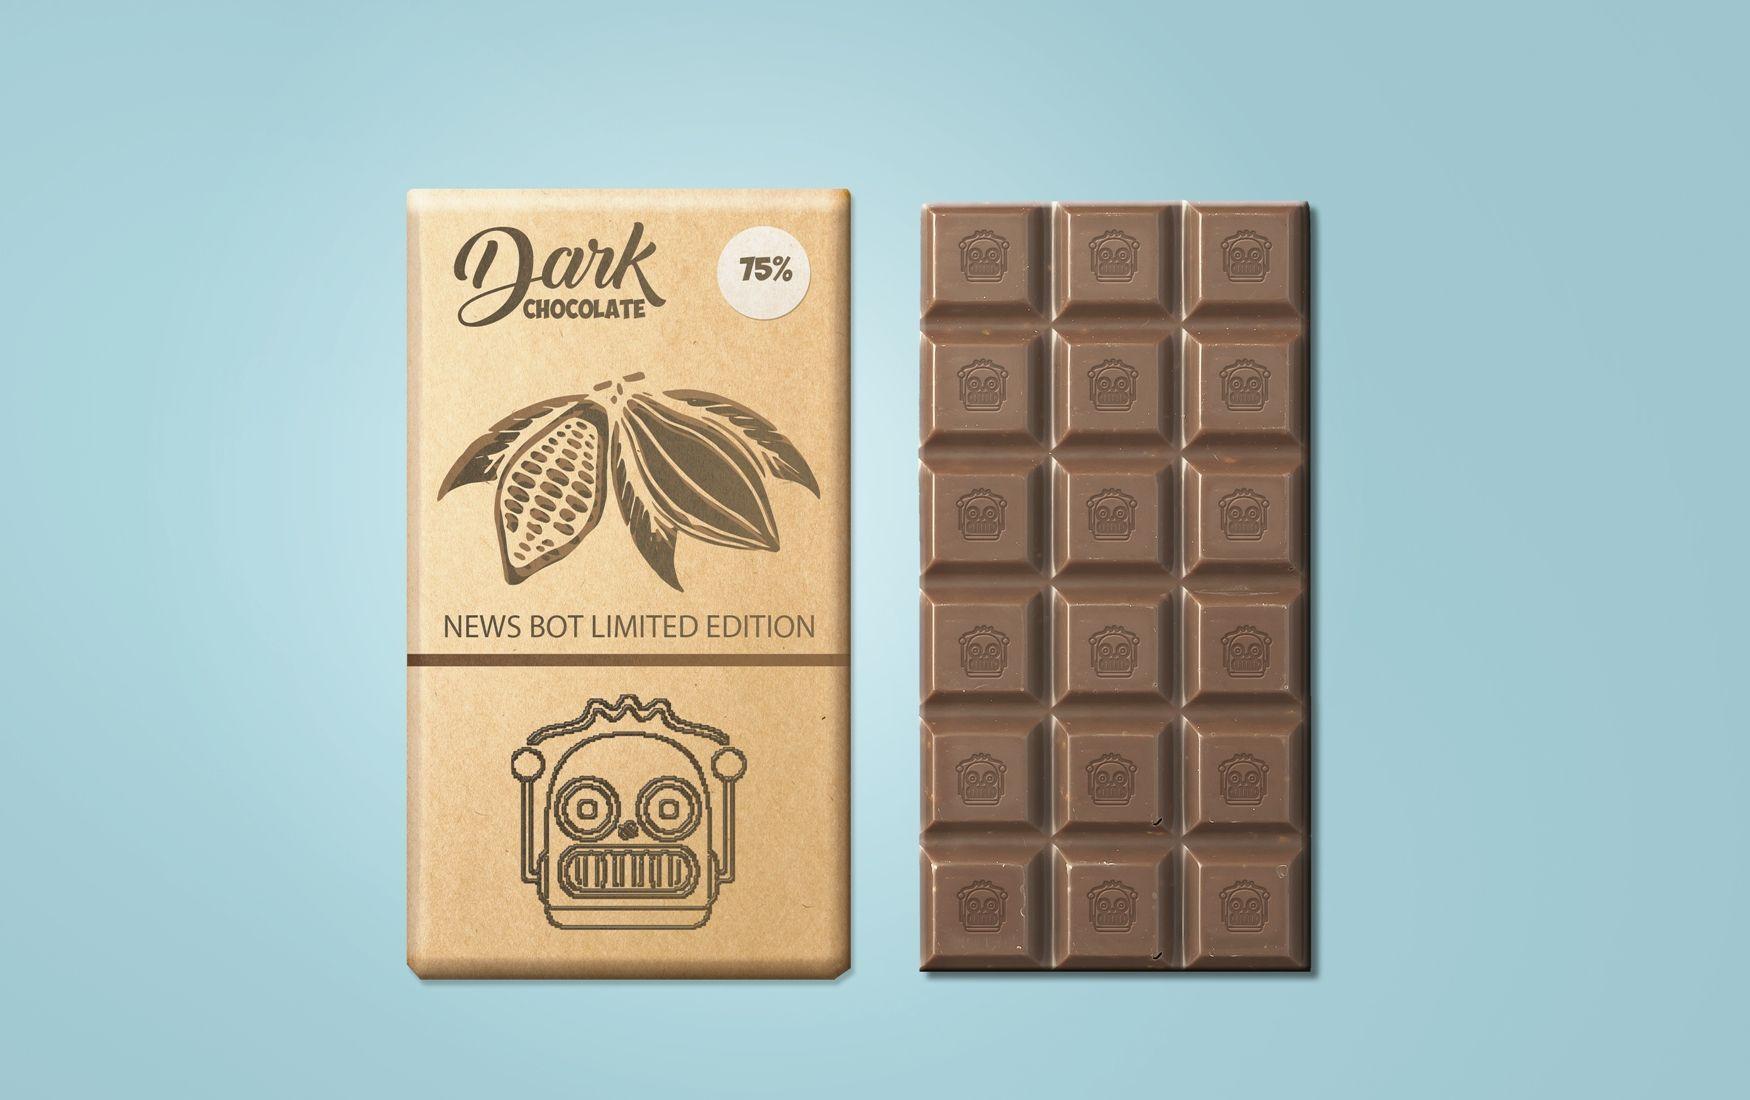 chocolate-bar-mockup-by-PhotoshopSupply.jpg